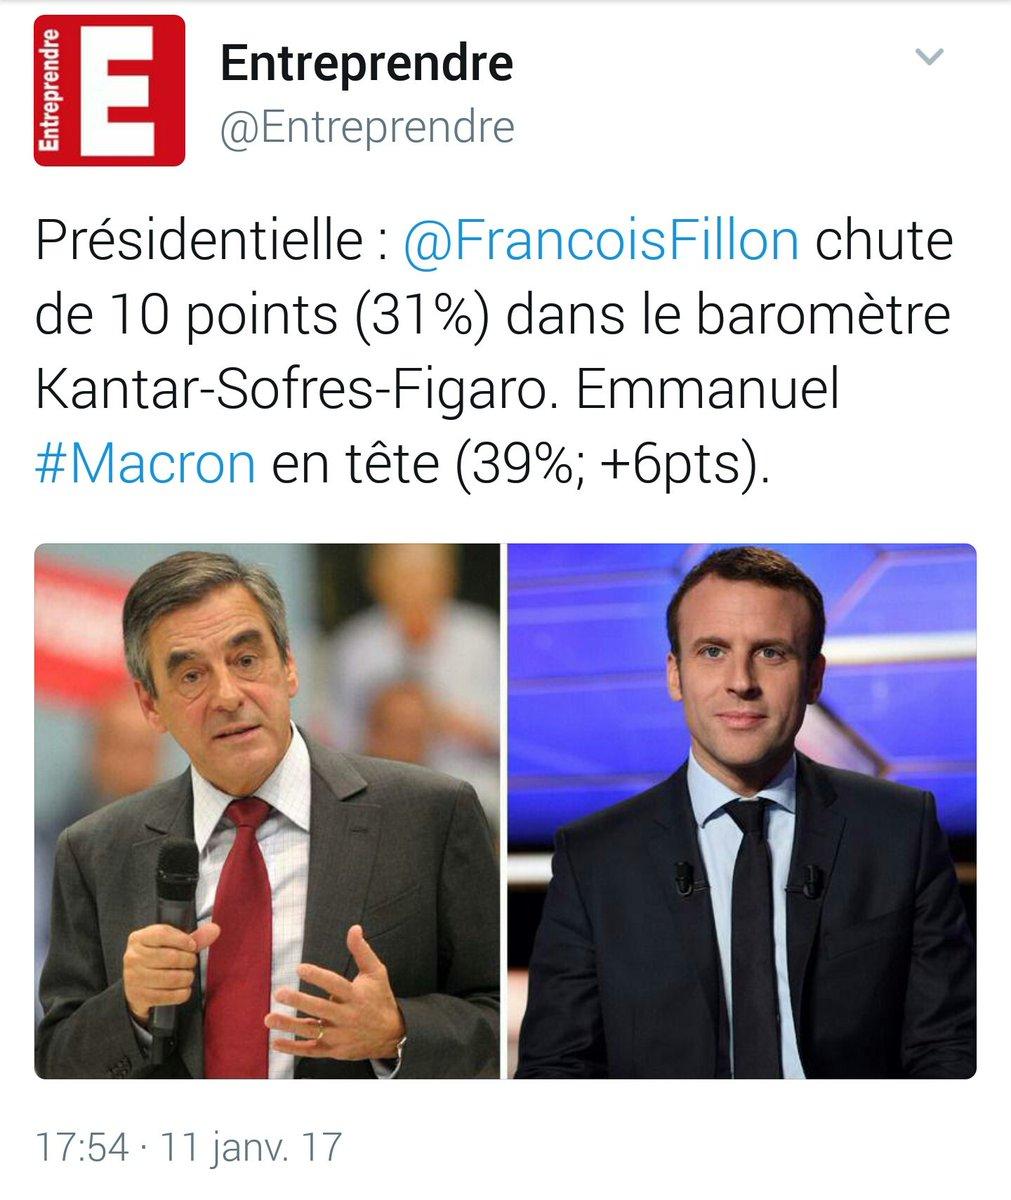 #BreakingNews  #Presidentielle2017  @EmmanuelMacron +6 pts à 39% Chute vertigineuse de 10 pts pour @FrancoisFillon à 31% #macron2017<br>http://pic.twitter.com/kEOOMqbNuI